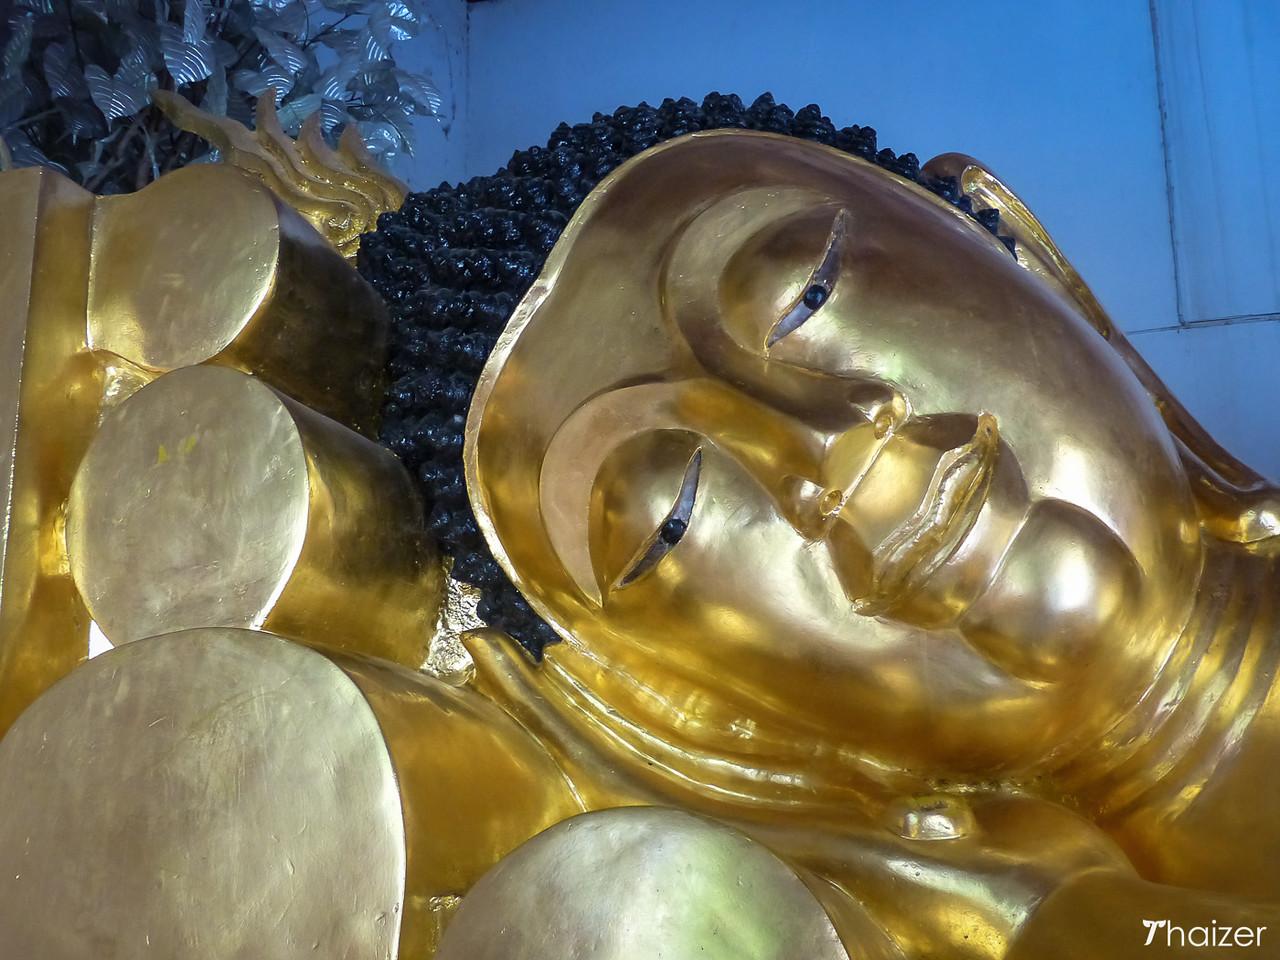 reclining Buddha at Wat Phra Singh, Chiang Mai